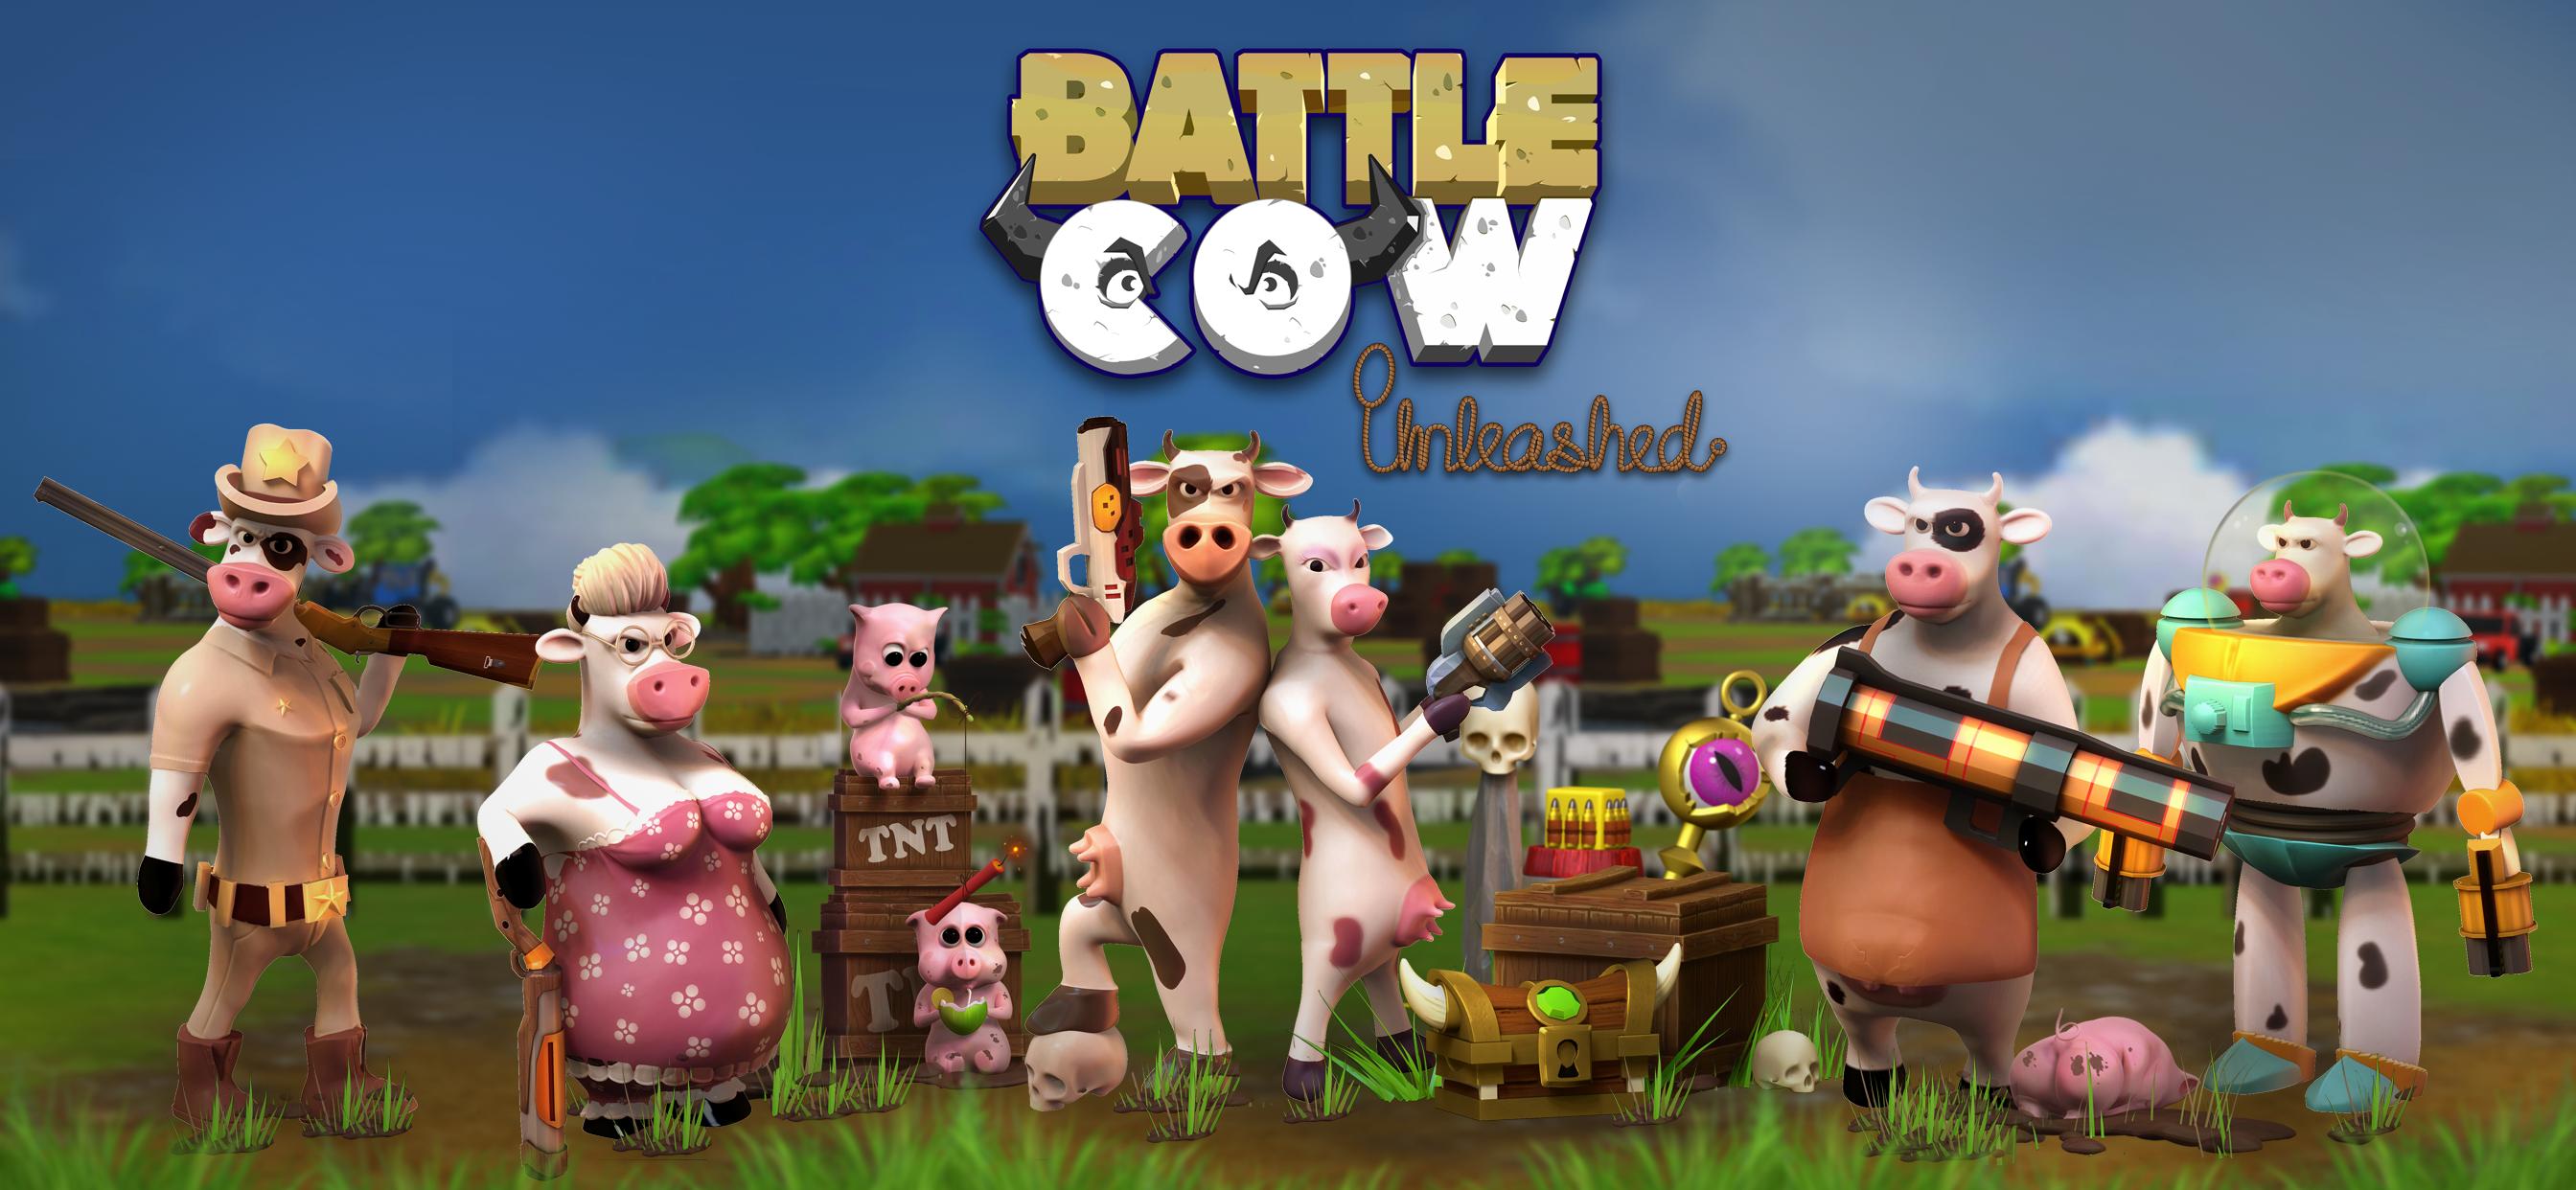 Battle Cow Unleashed